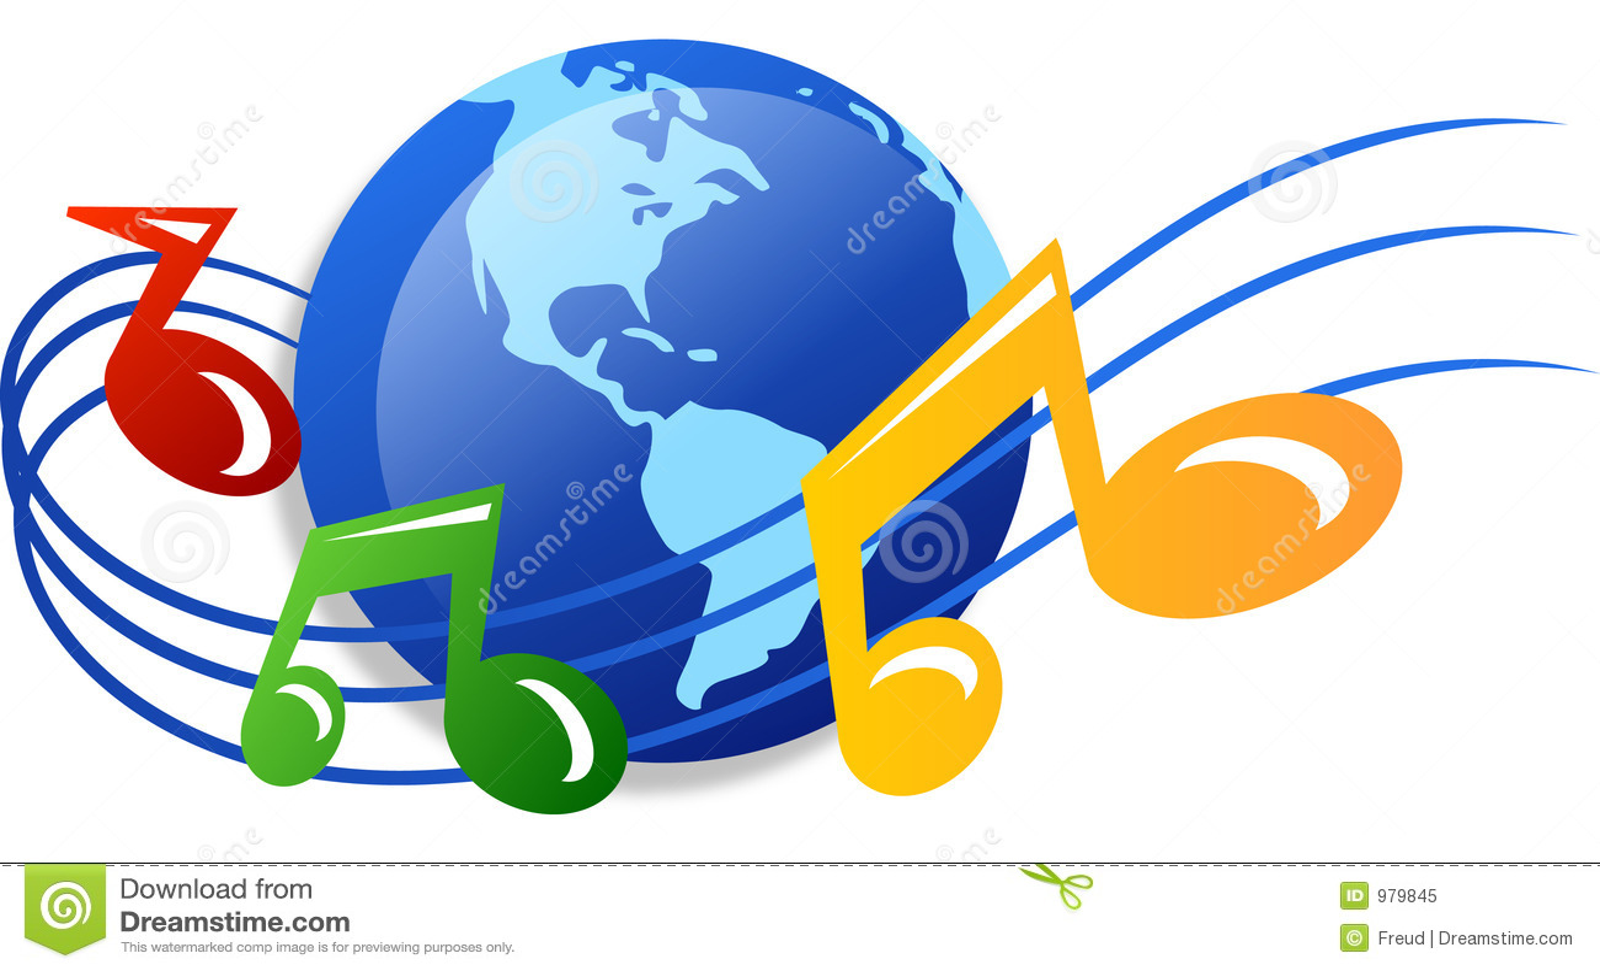 World Of Music Royalty Free Stock Photo - Image: 979845